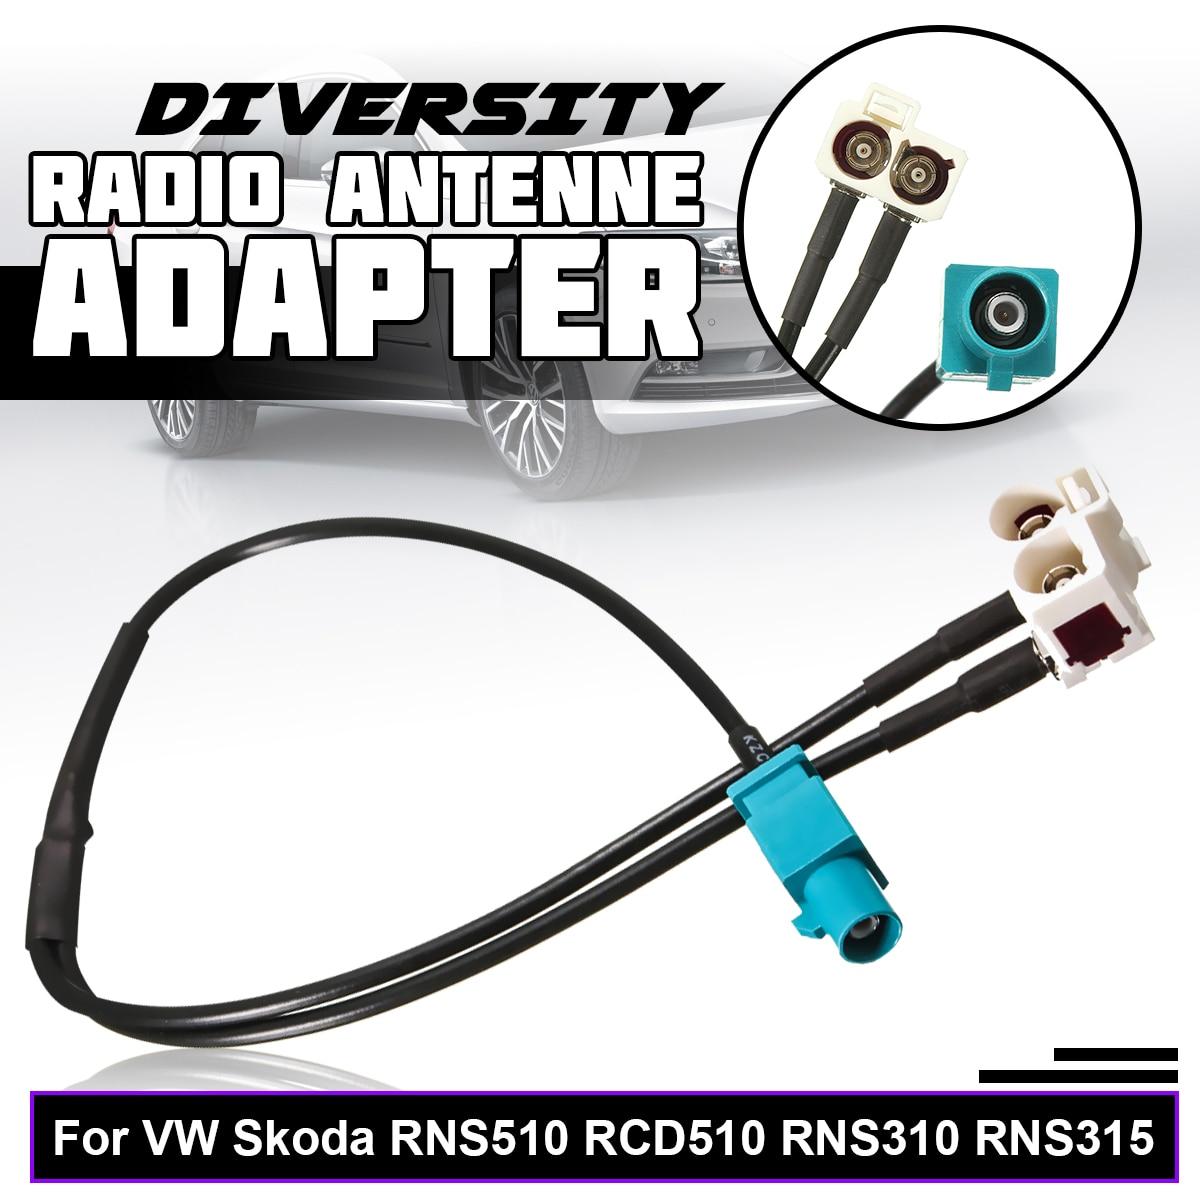 35cm For VW for Skoda RNS510 RCD510 RNS310 RNS315 Brand New Diversity Radio  Antenne Adapter FAKRA RG174